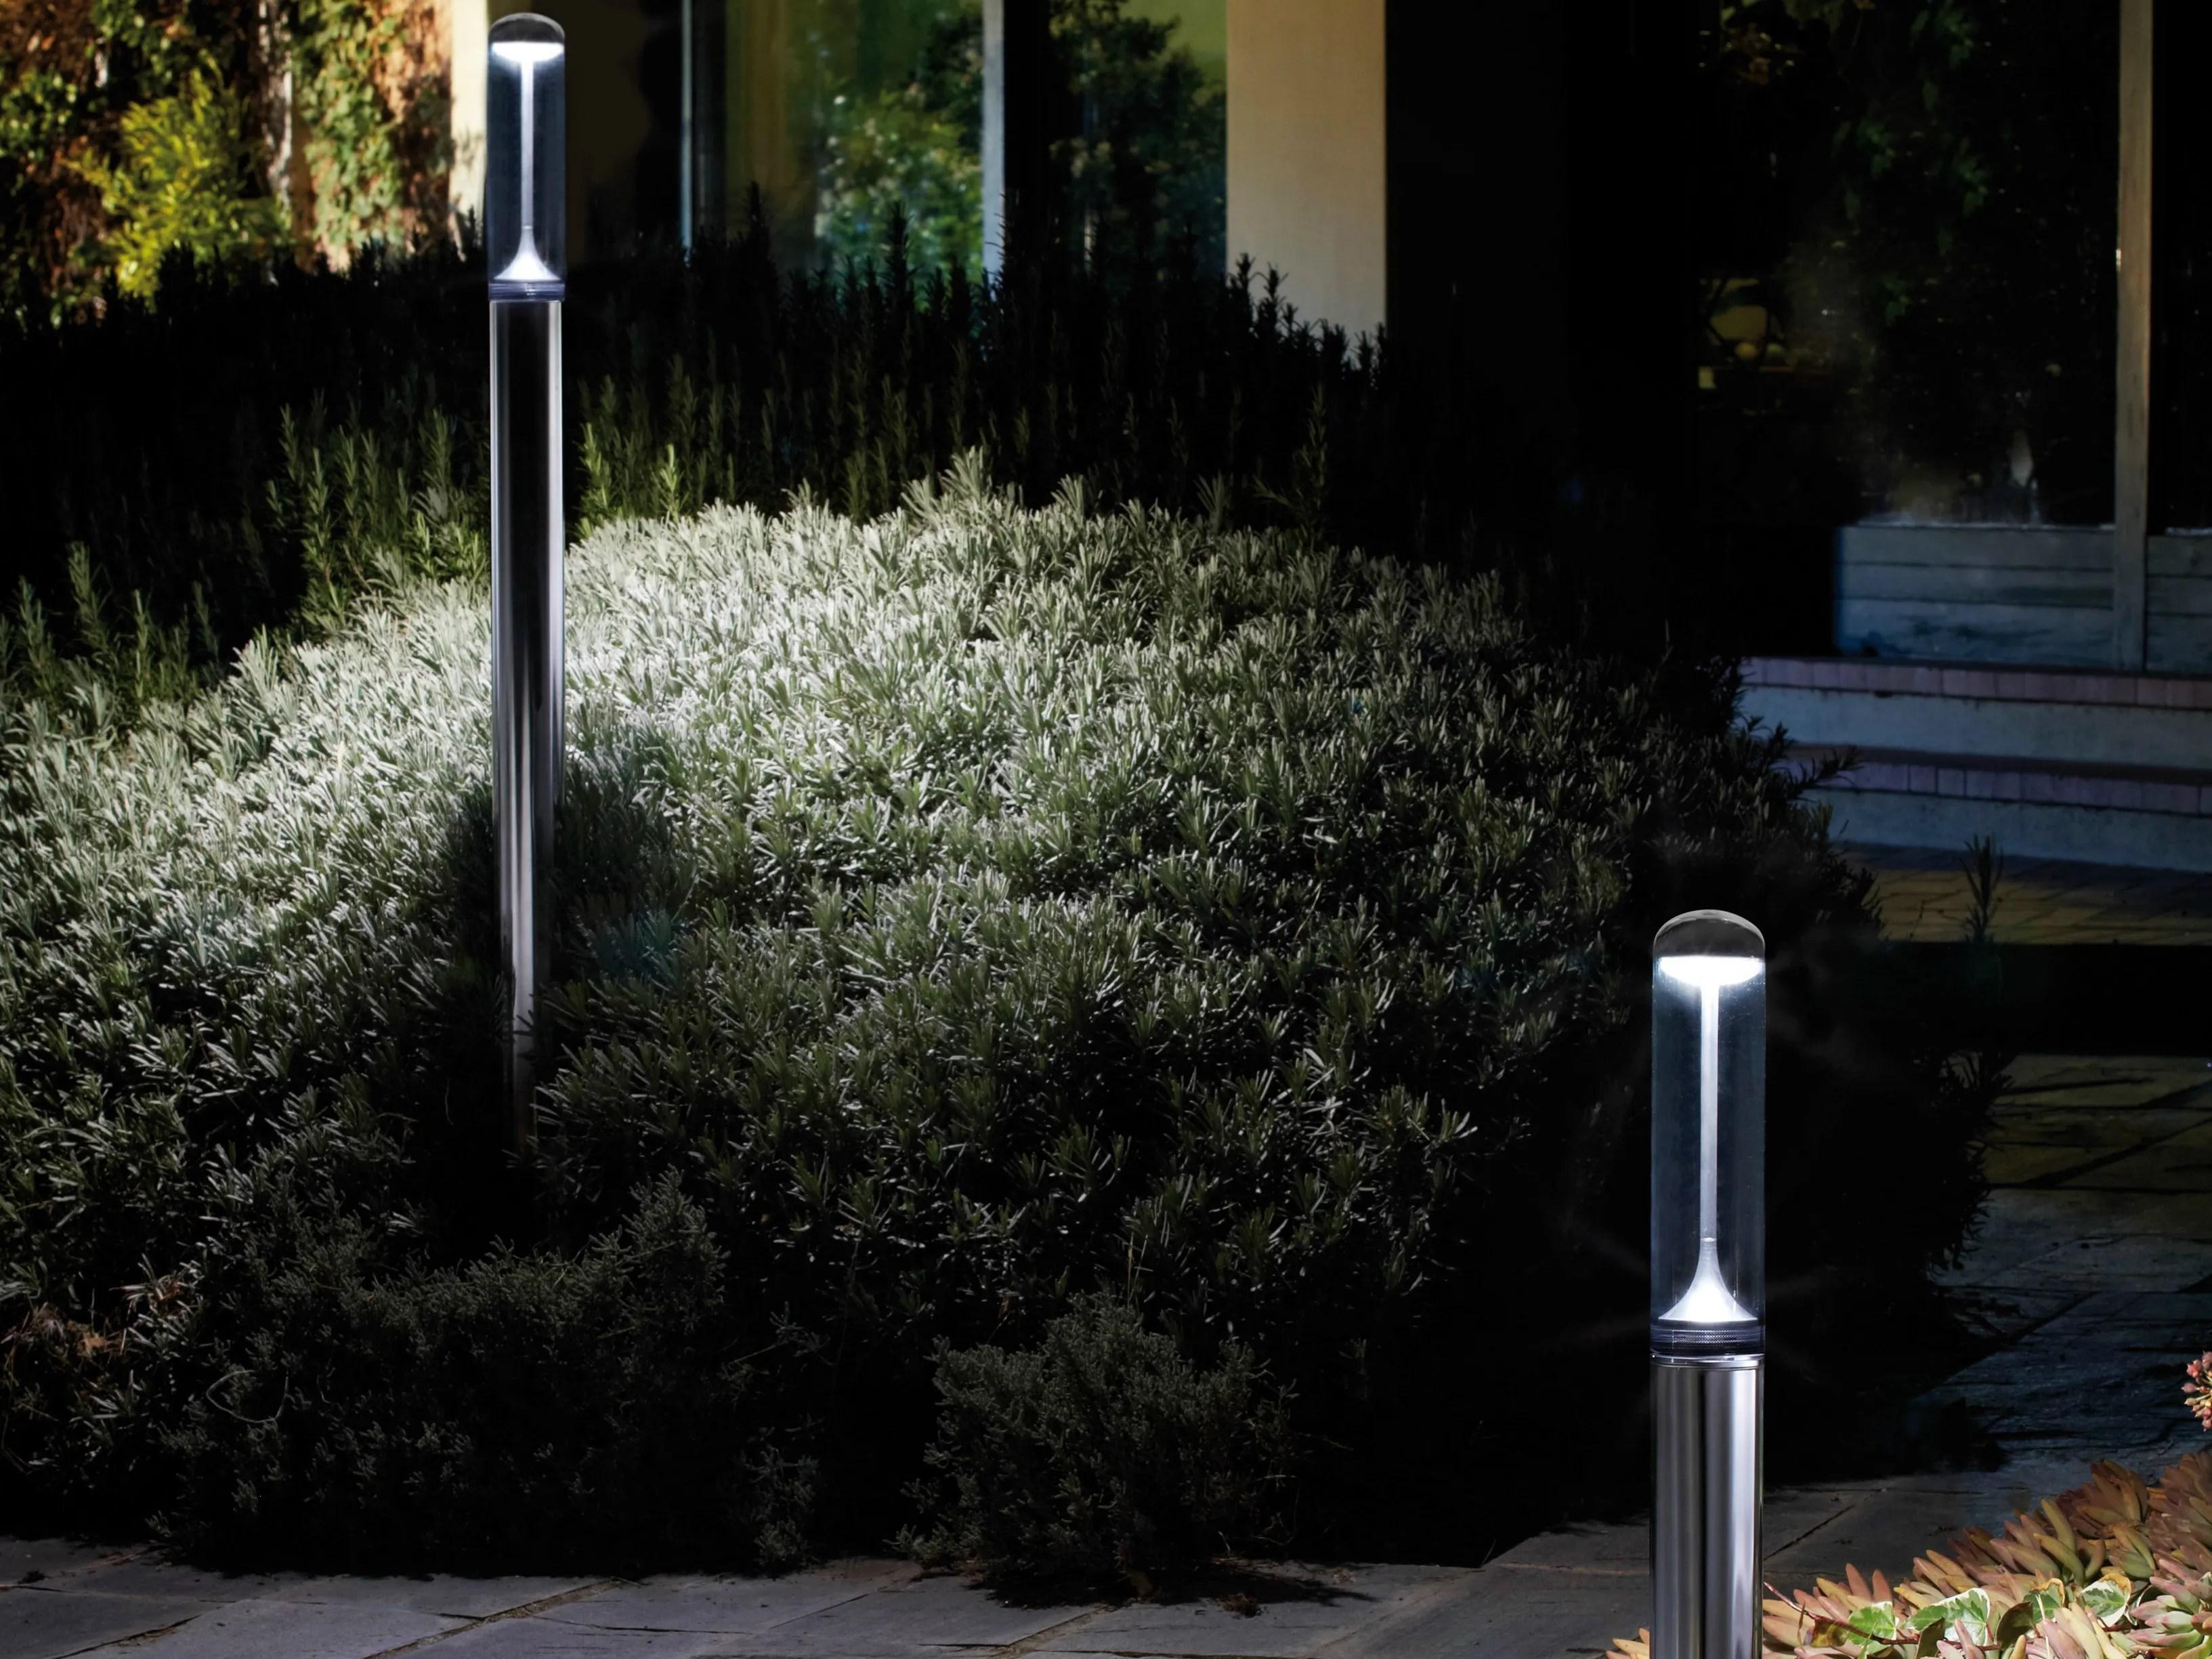 Led Bollard Light Imago By Goccia Illuminazione